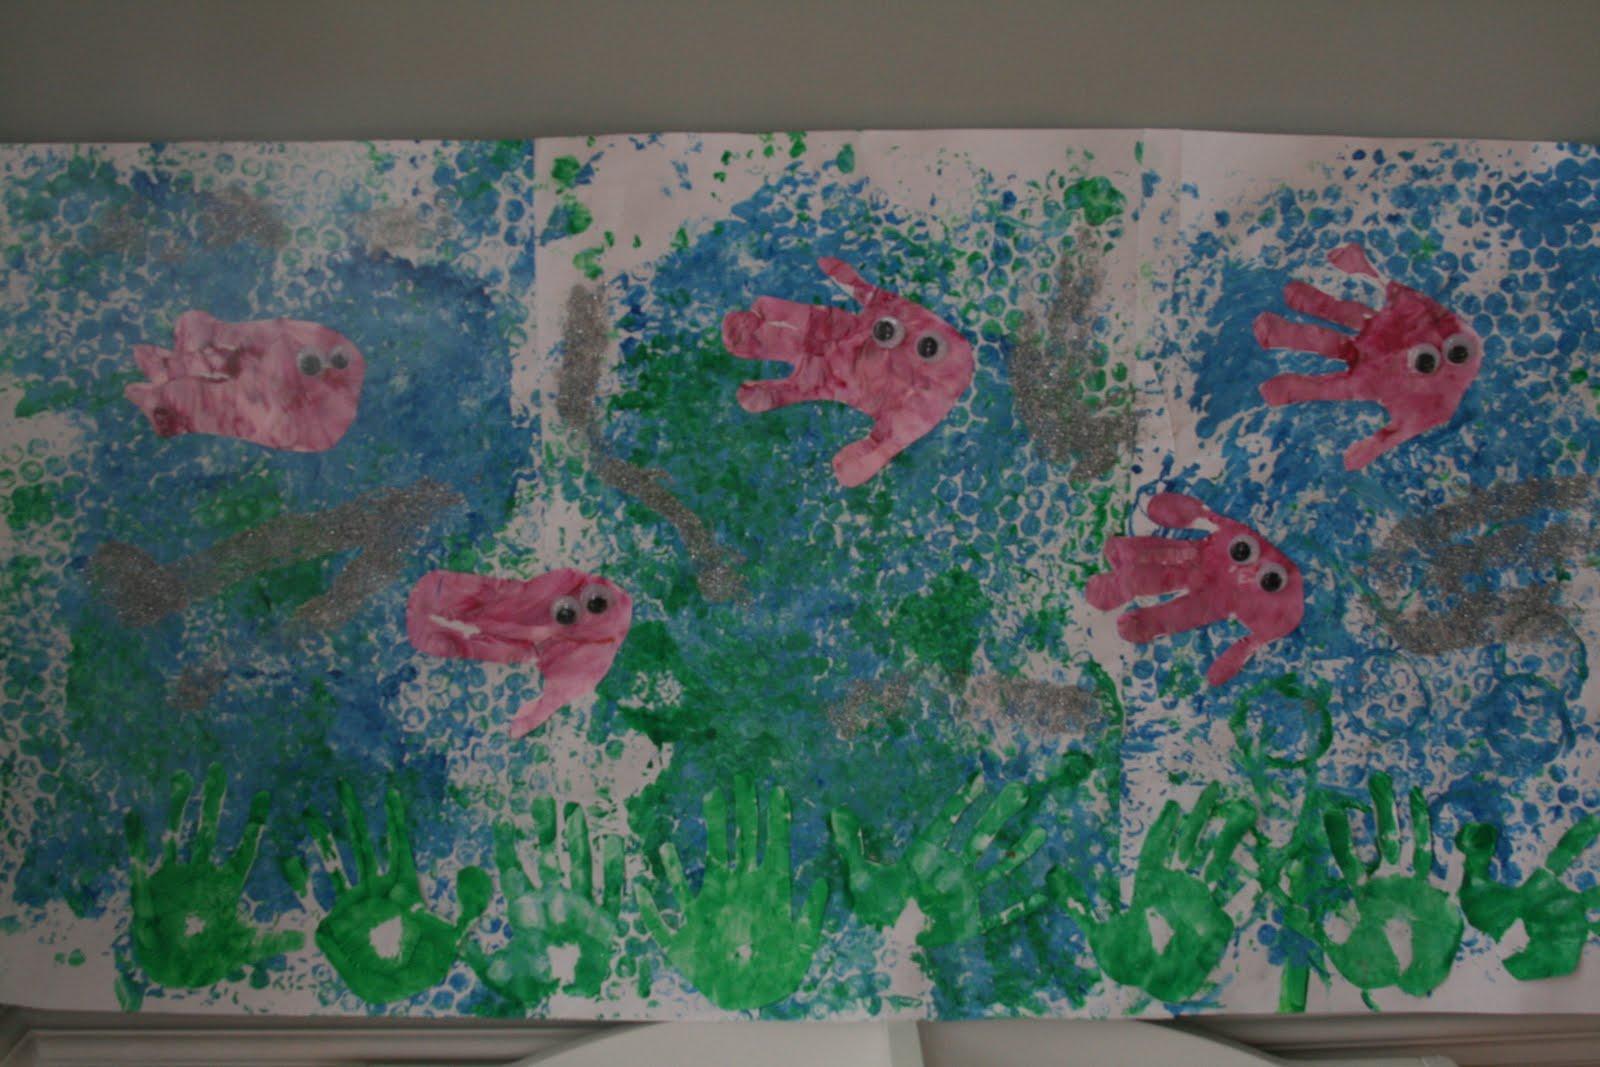 Bubblewrap Print Seascape The Imagination Tree